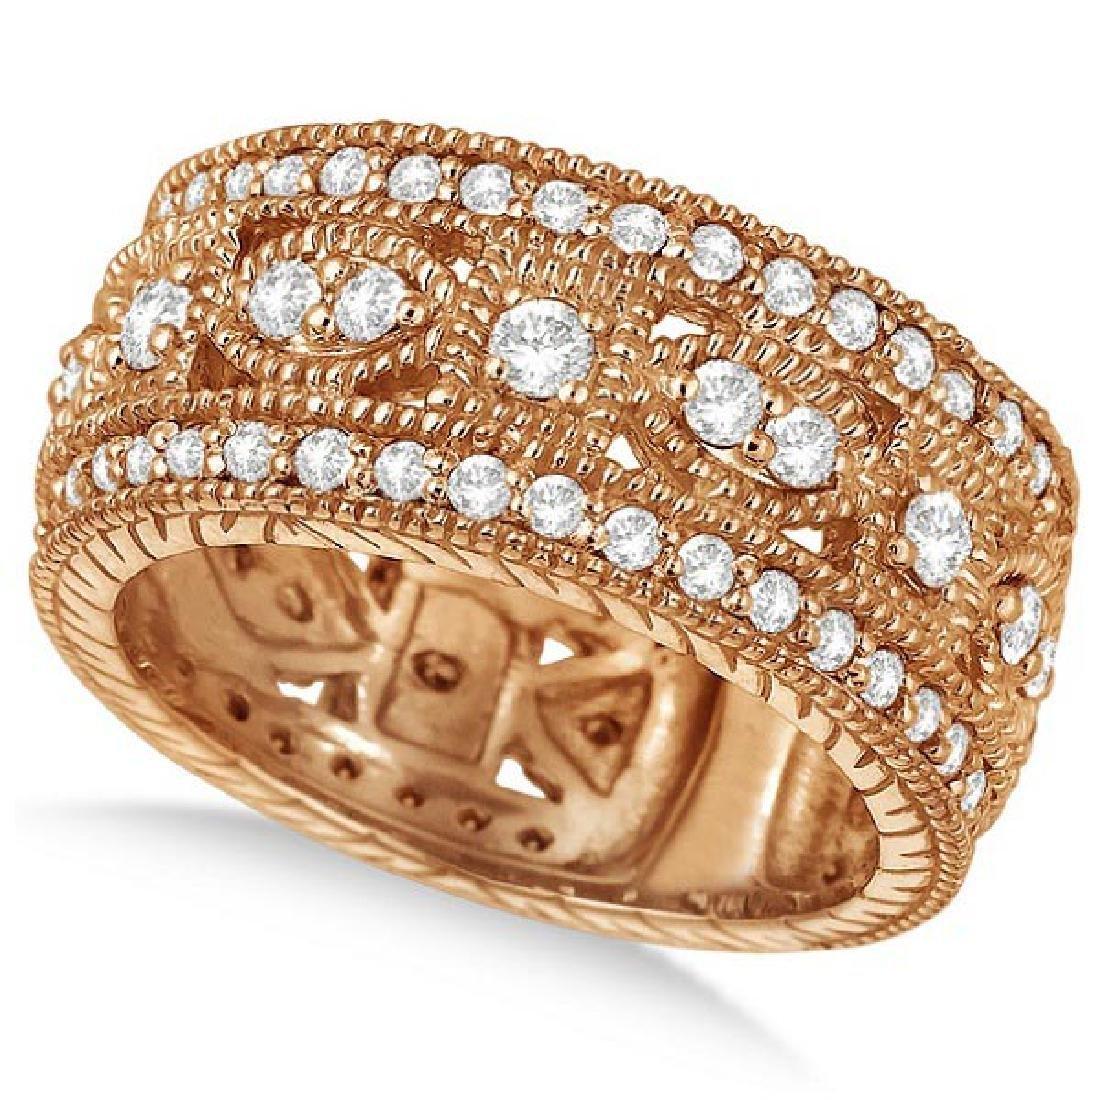 Vintage Style Byzantine Wide Band Diamond Ring 14k Rose